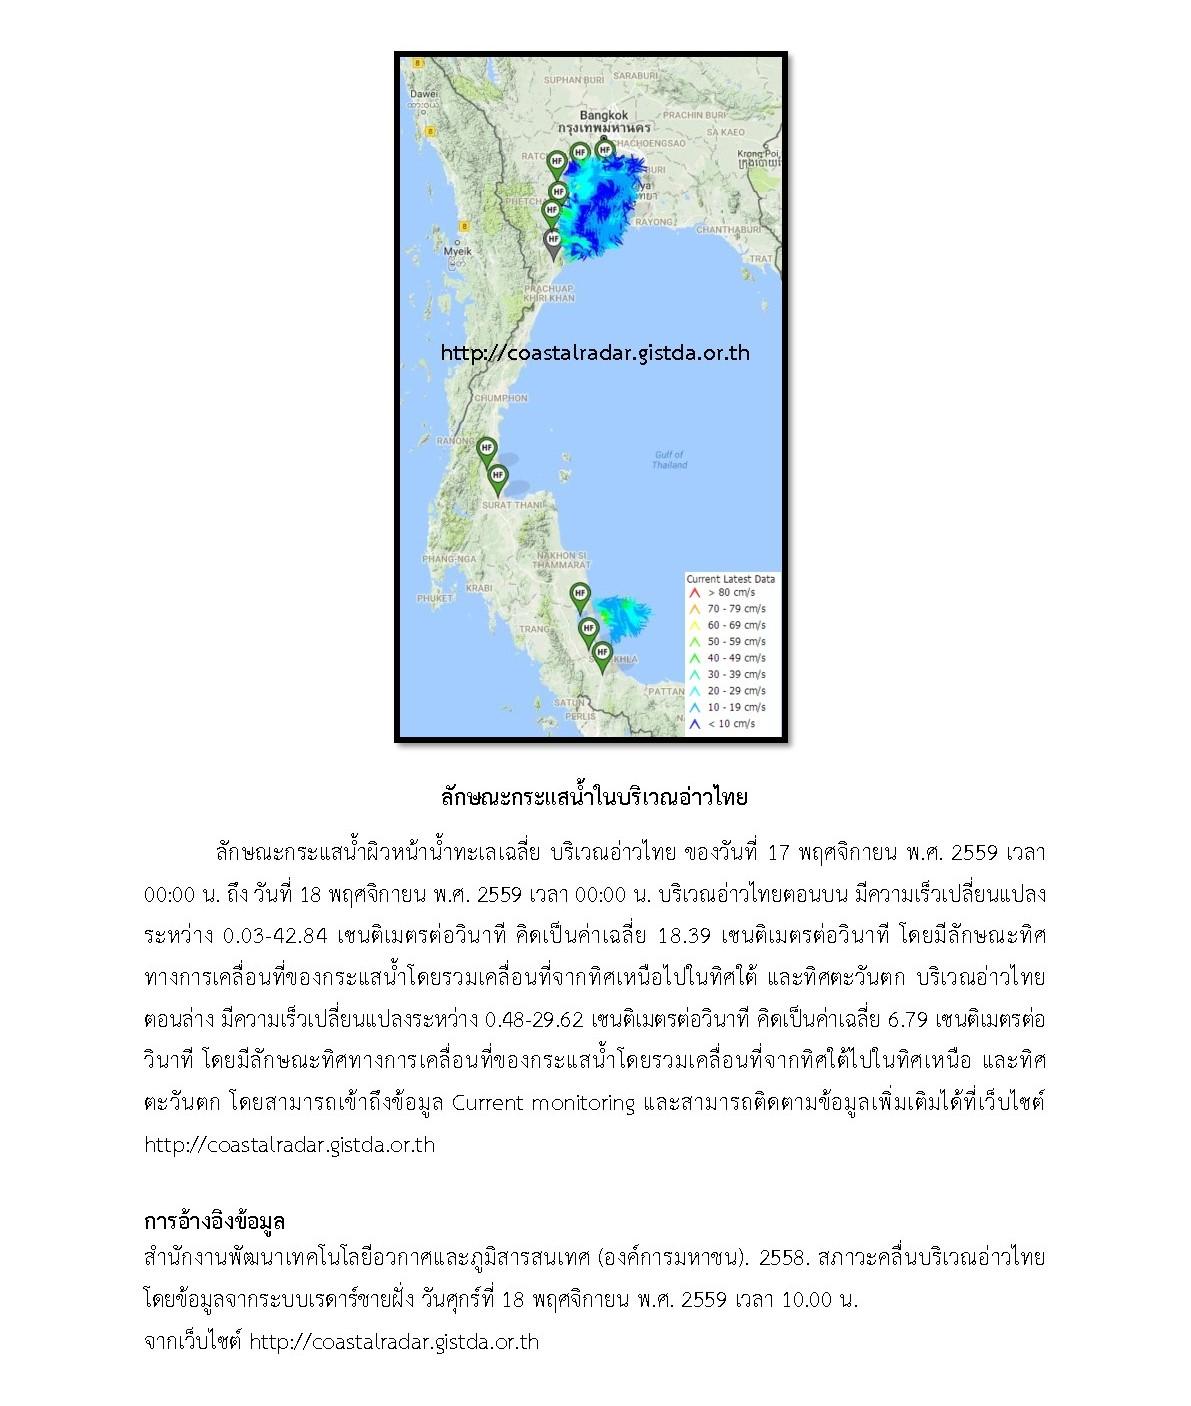 20161118-004-004